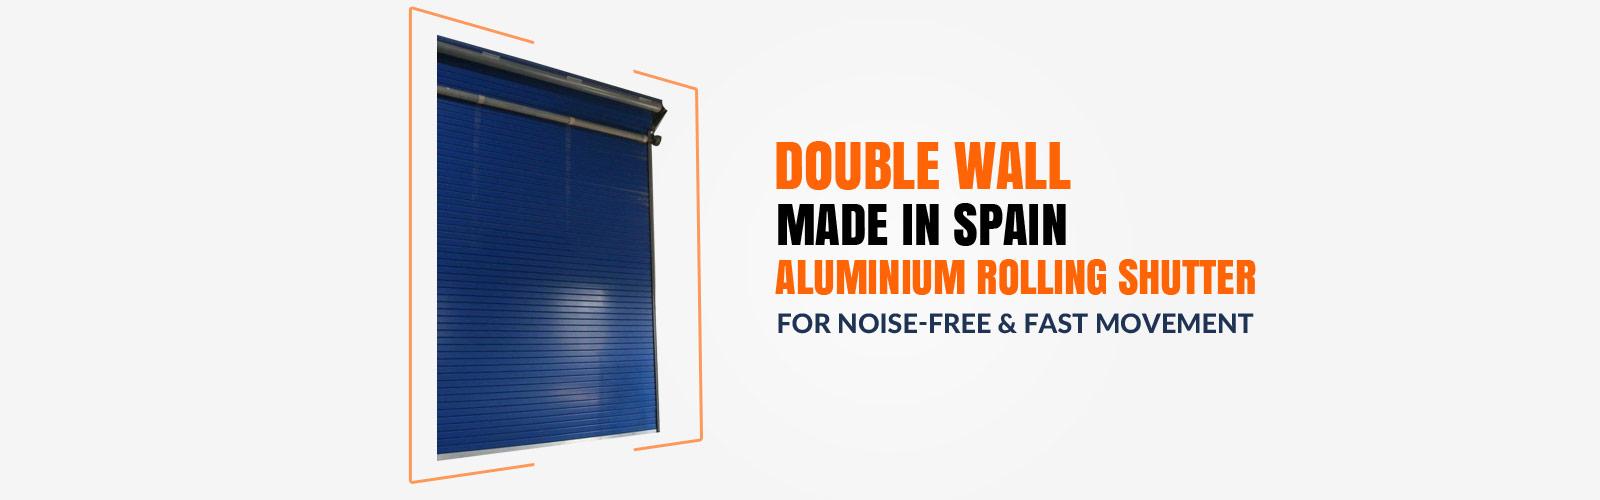 Aluminium Rolling Shutter <span> Made in Spain